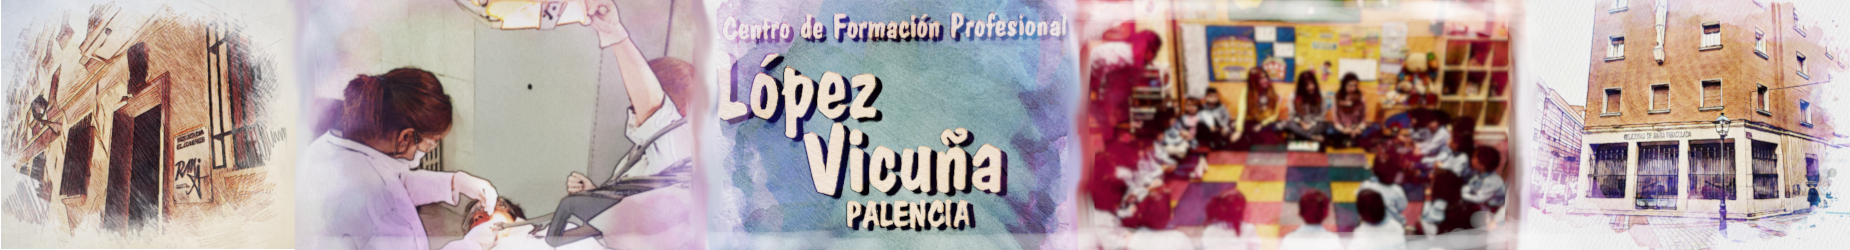 Centro de F.P. López Vicuña - Palencia